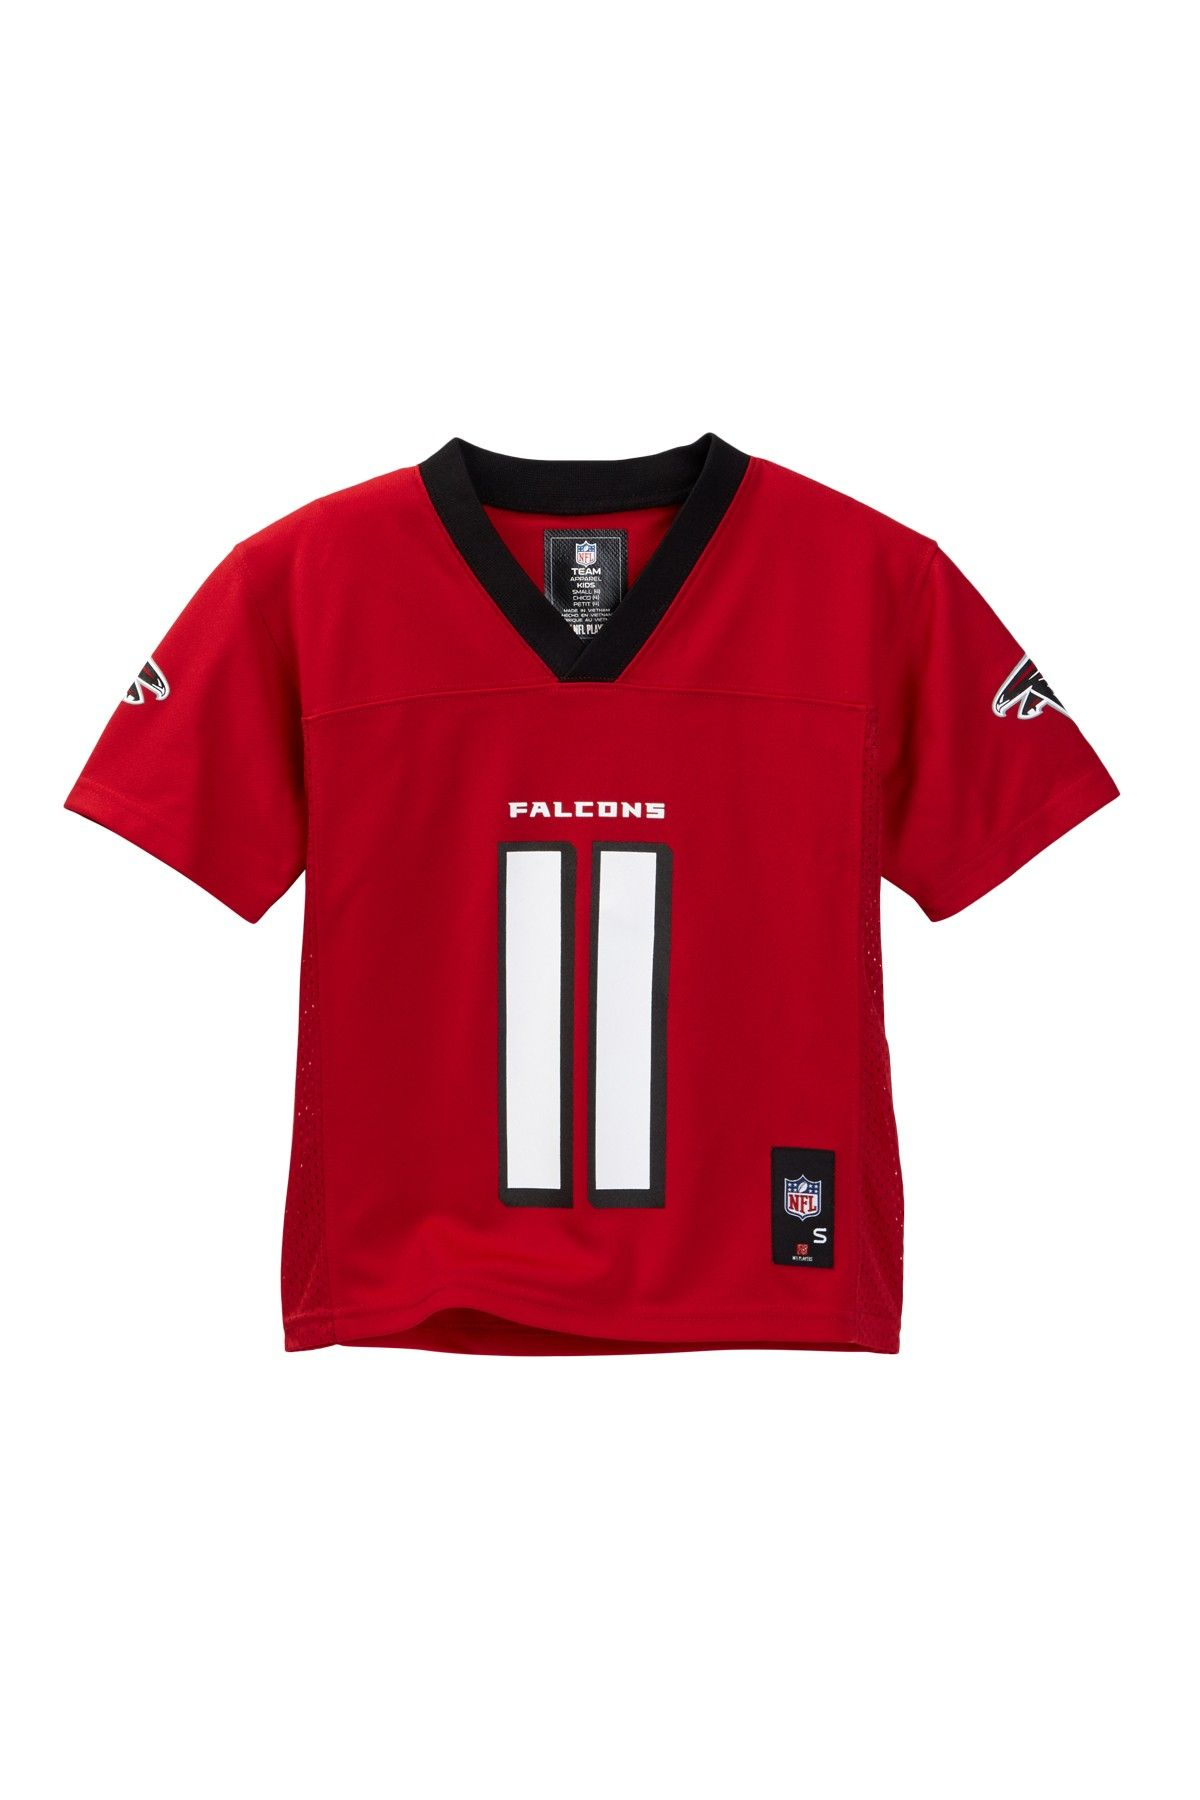 Nfl Logos Atlanta Falcons Julio Jones Jersey Little Boys Atlanta Falcons Julio Jones Kids Fashion Photography